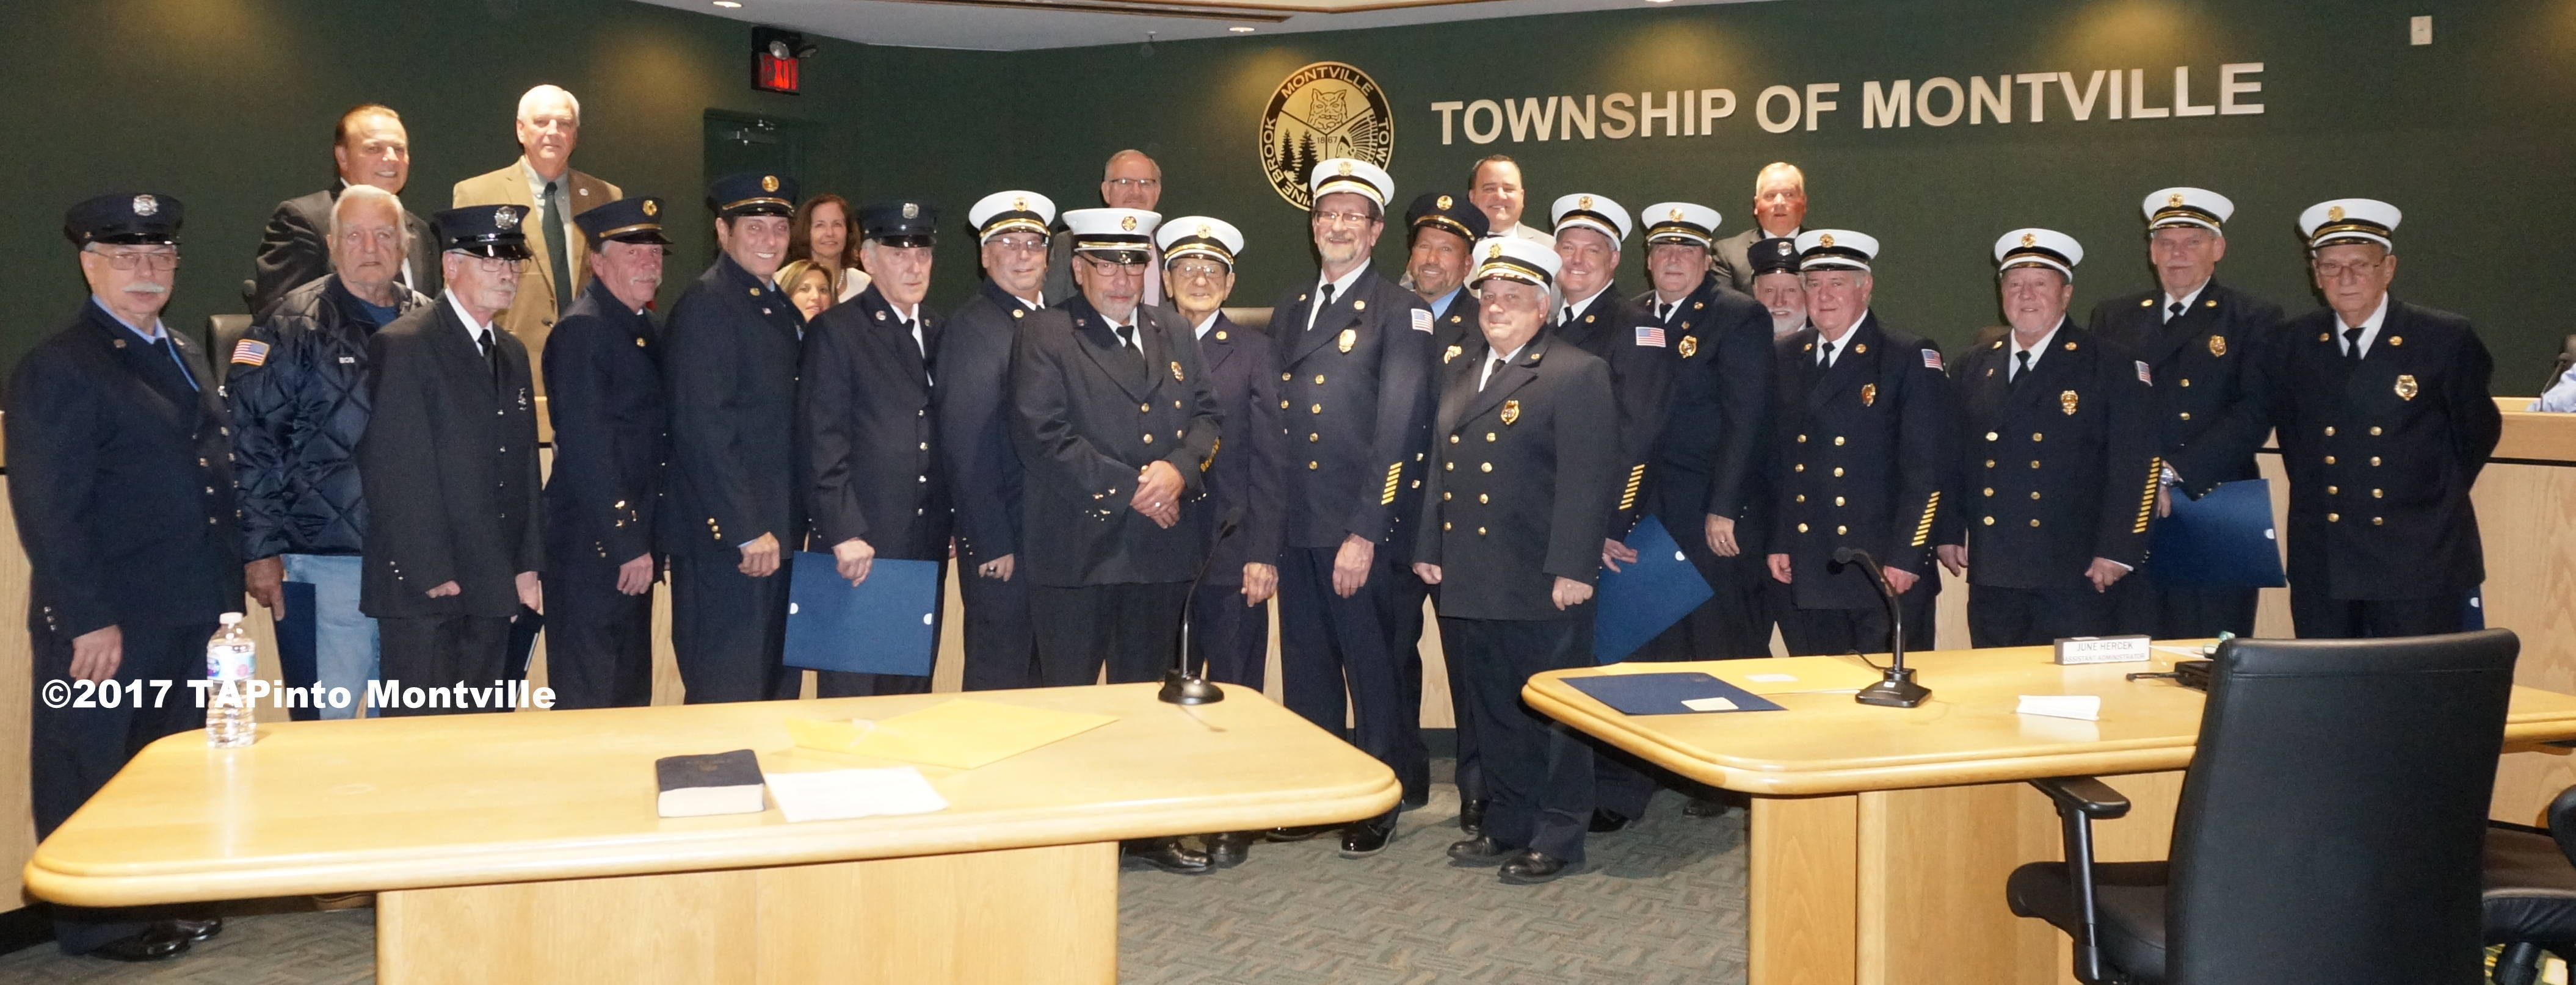 304b45c44502fa7ec248_a_Firefighters_honored.JPG